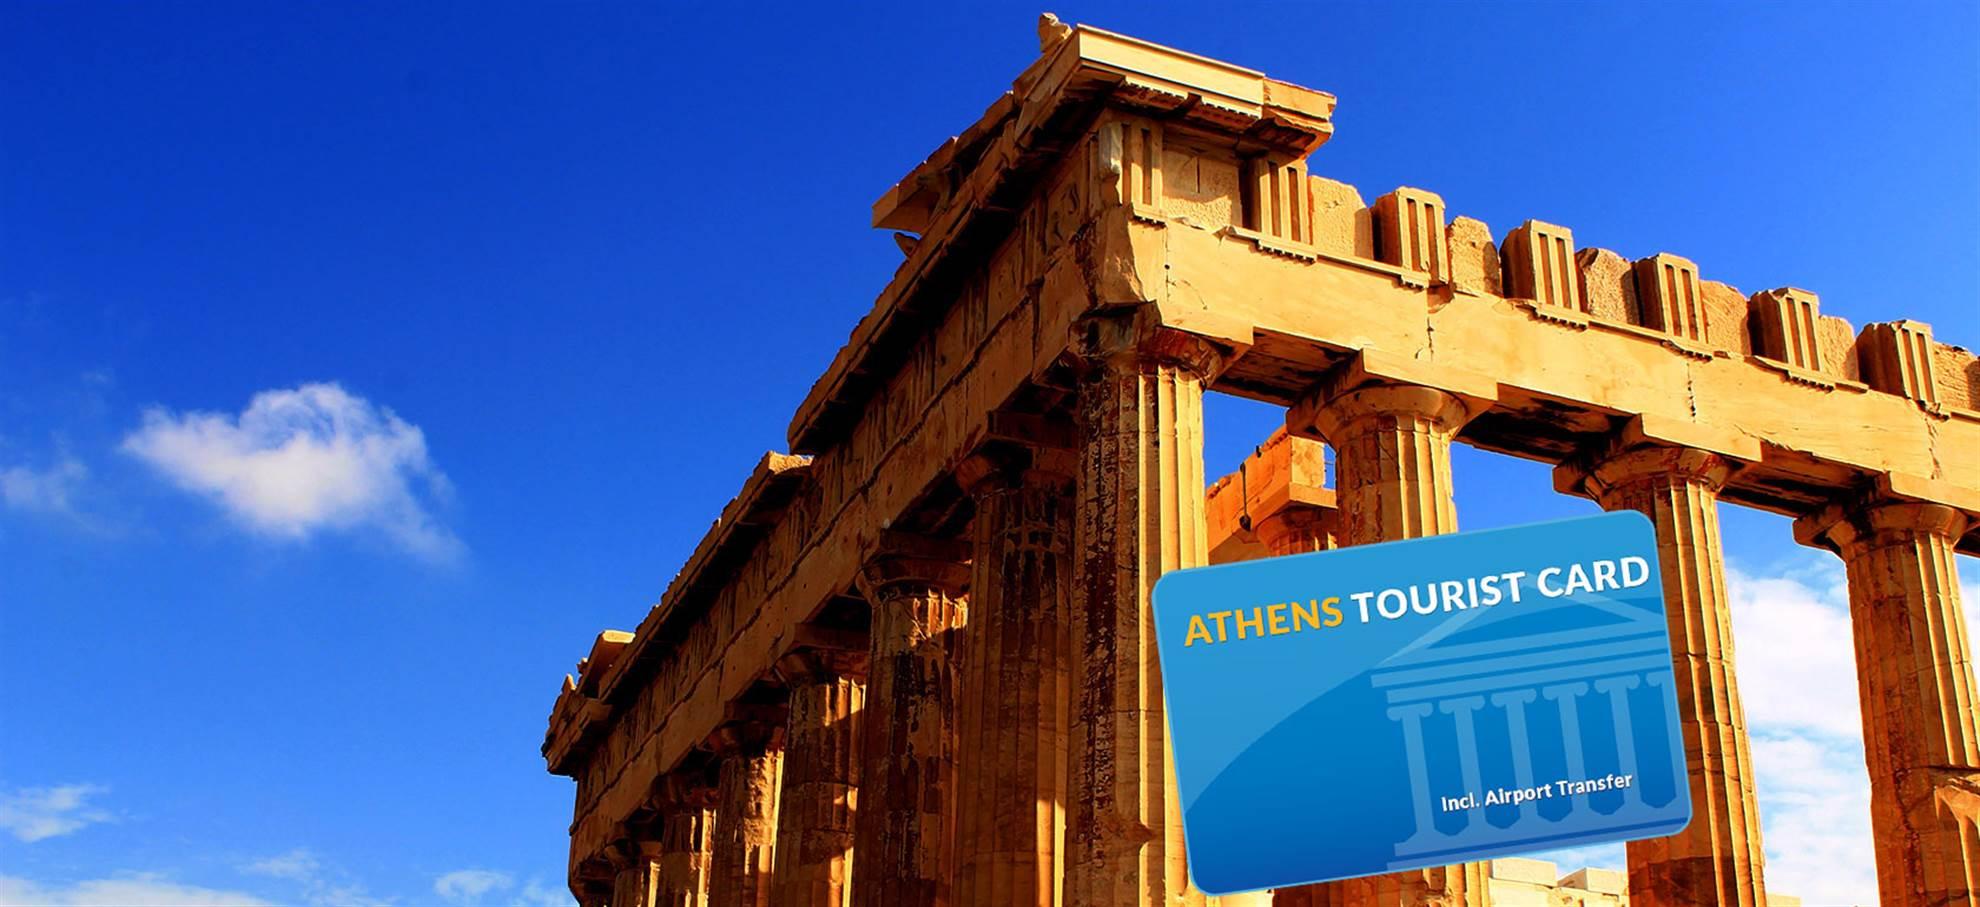 Aten Tourist Card (Inkl. Acropolis)